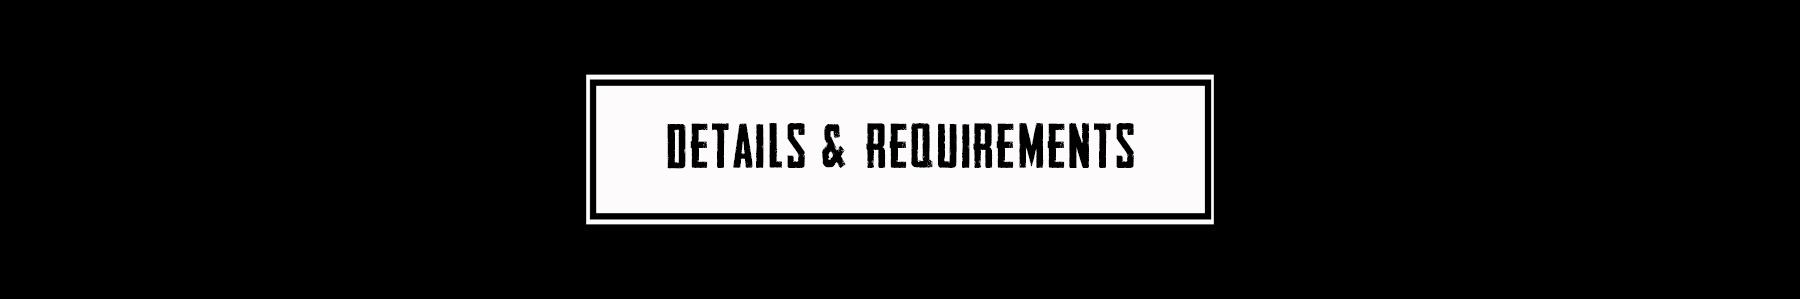 details-requirements-button.png